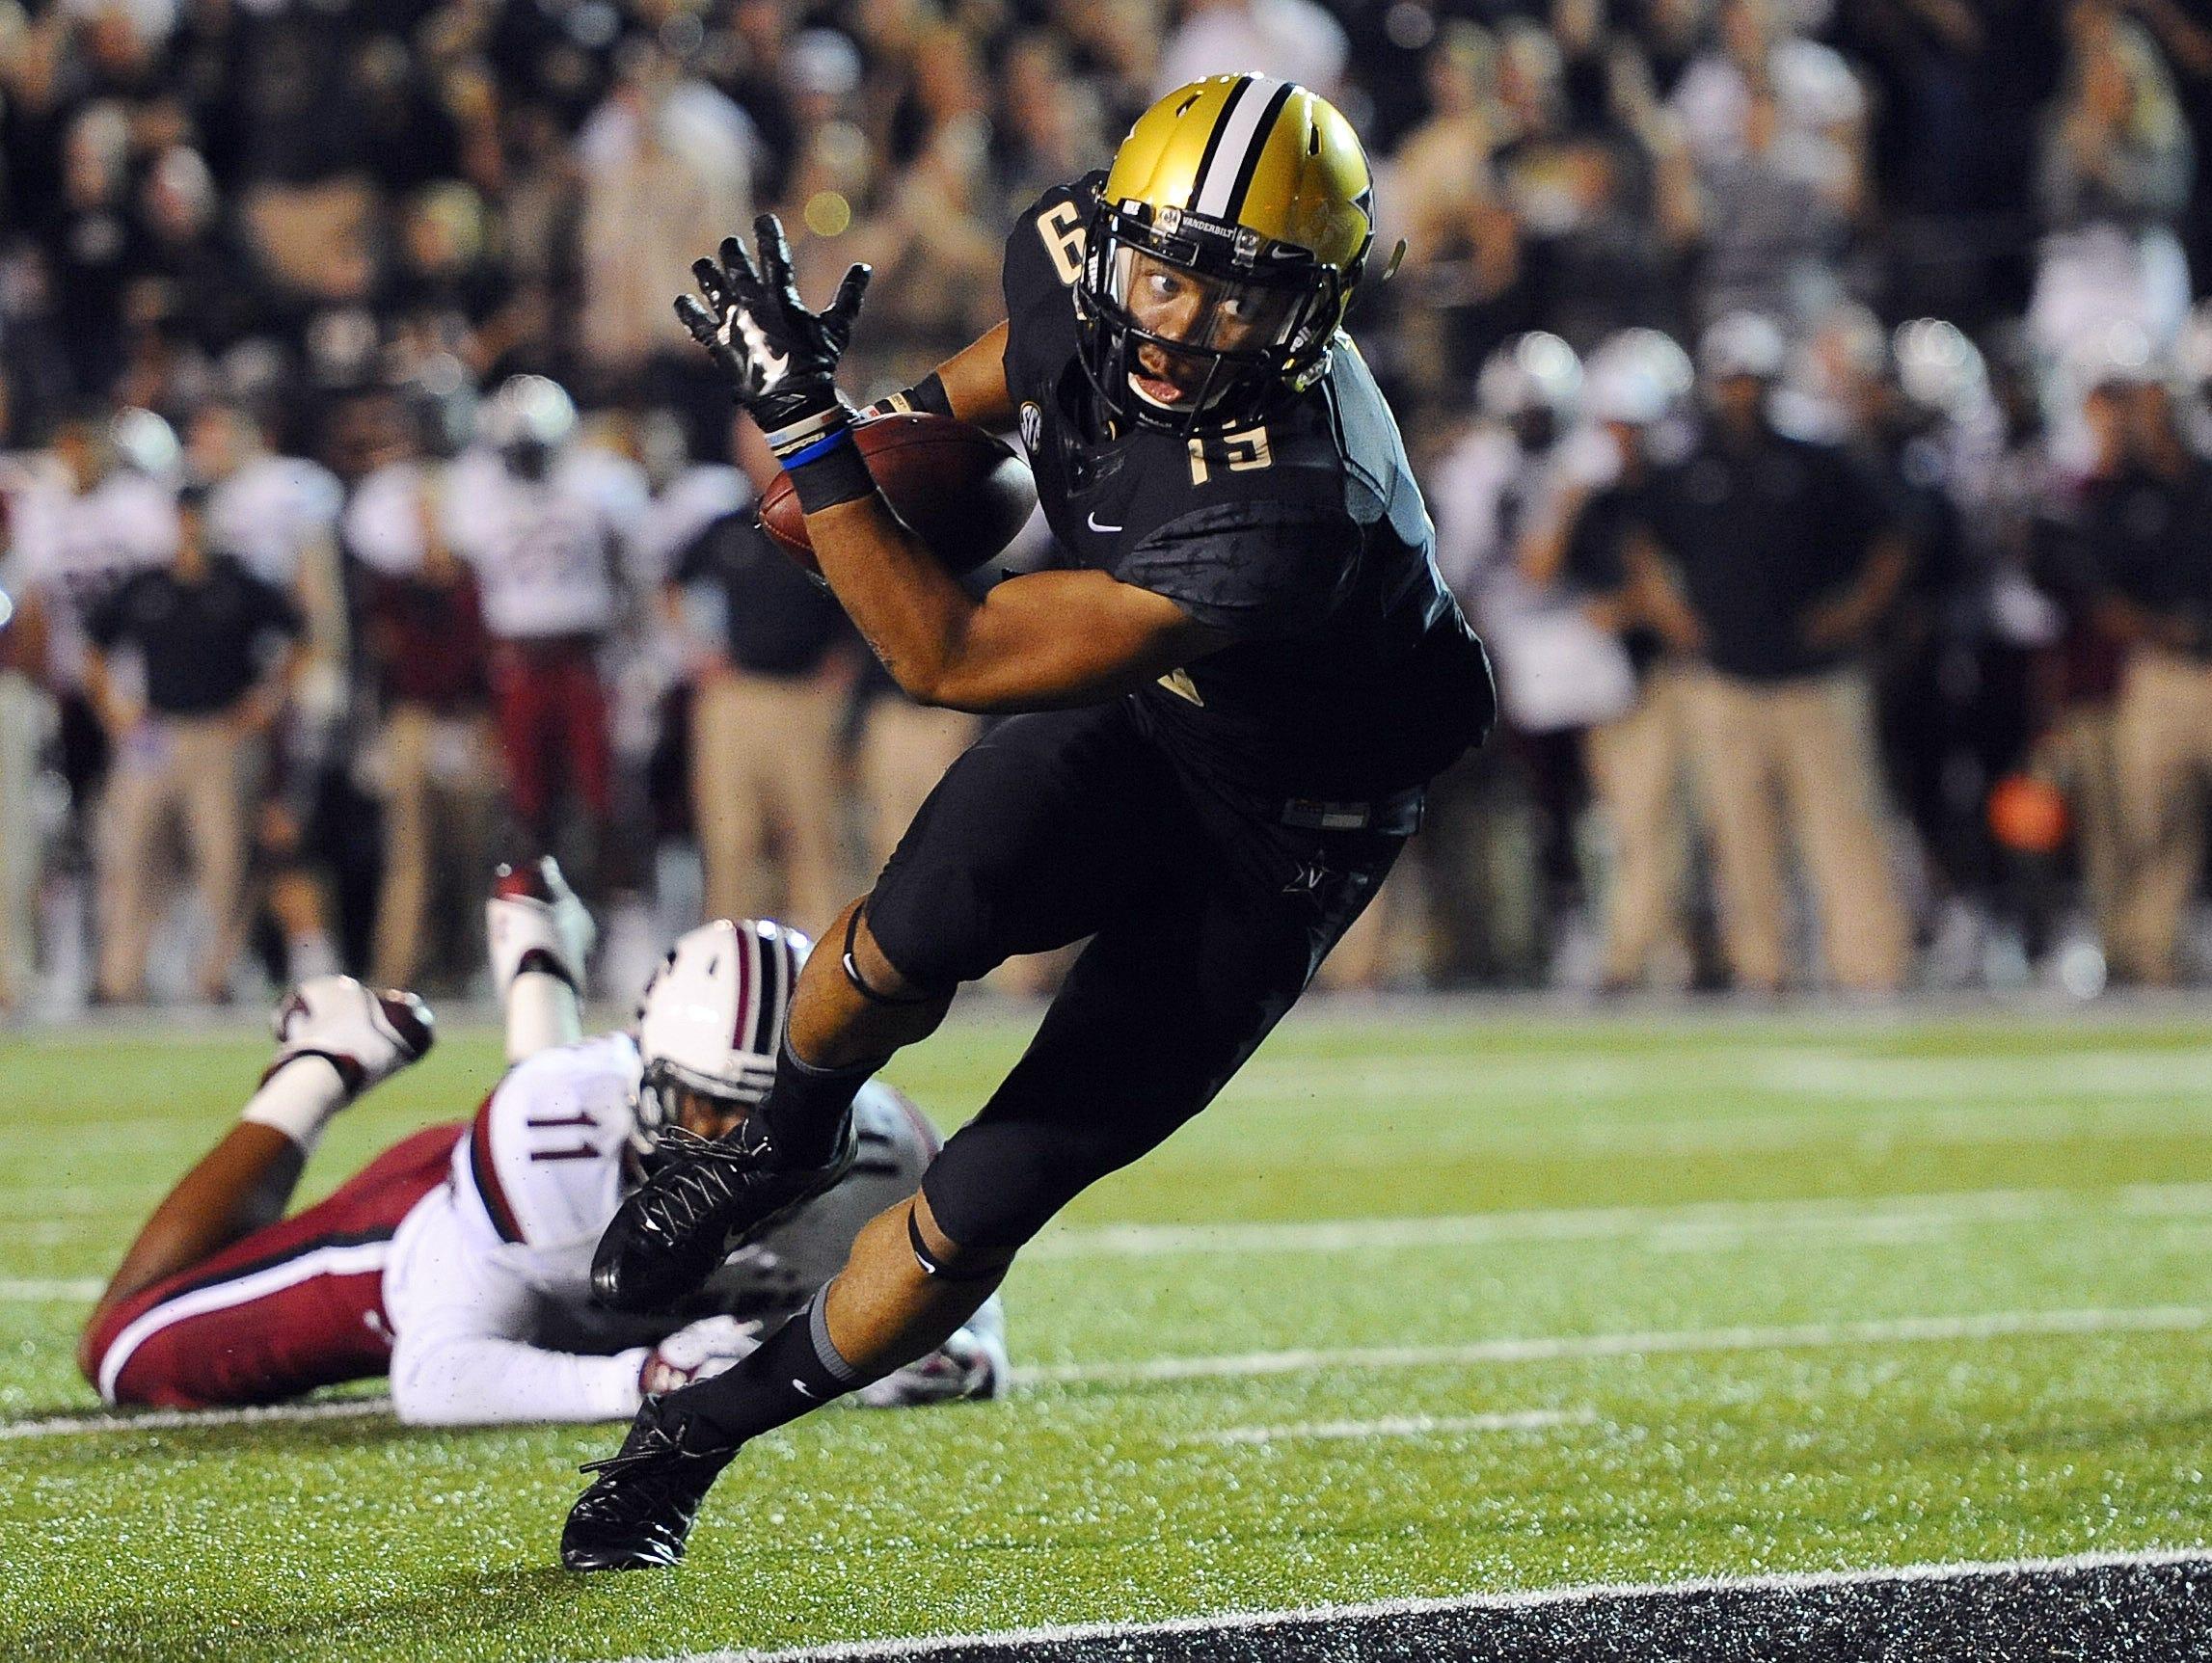 C.J. Duncan returns as Vanderbilt's most productive wide receiver.